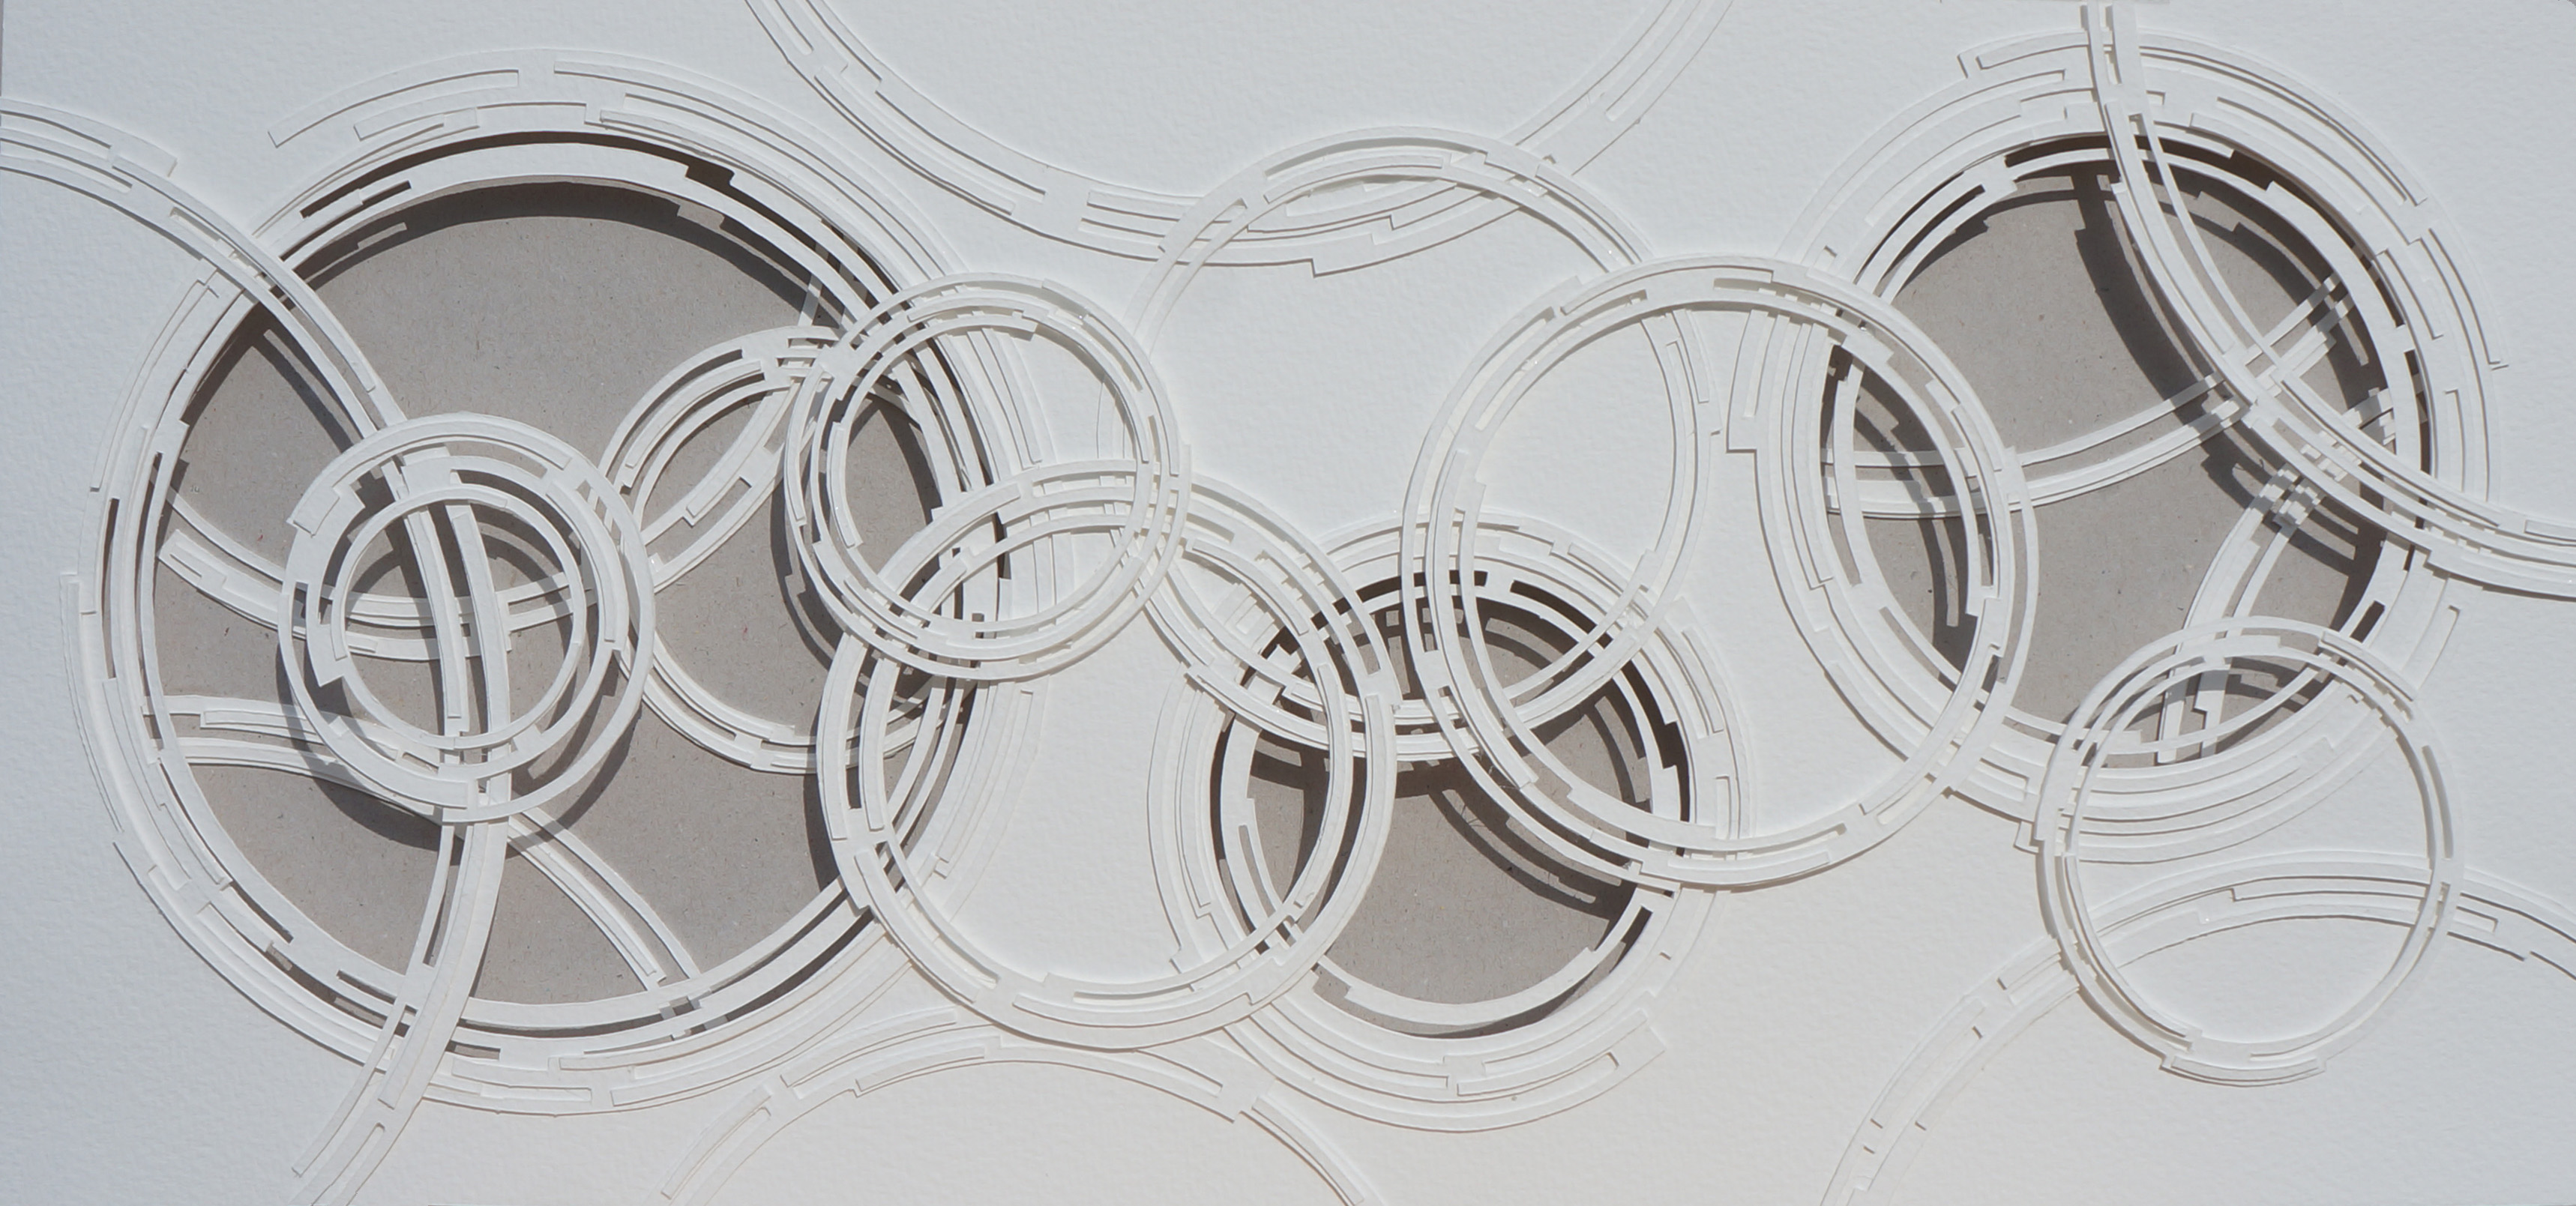 Grey and White Circles 62 x 32 cams